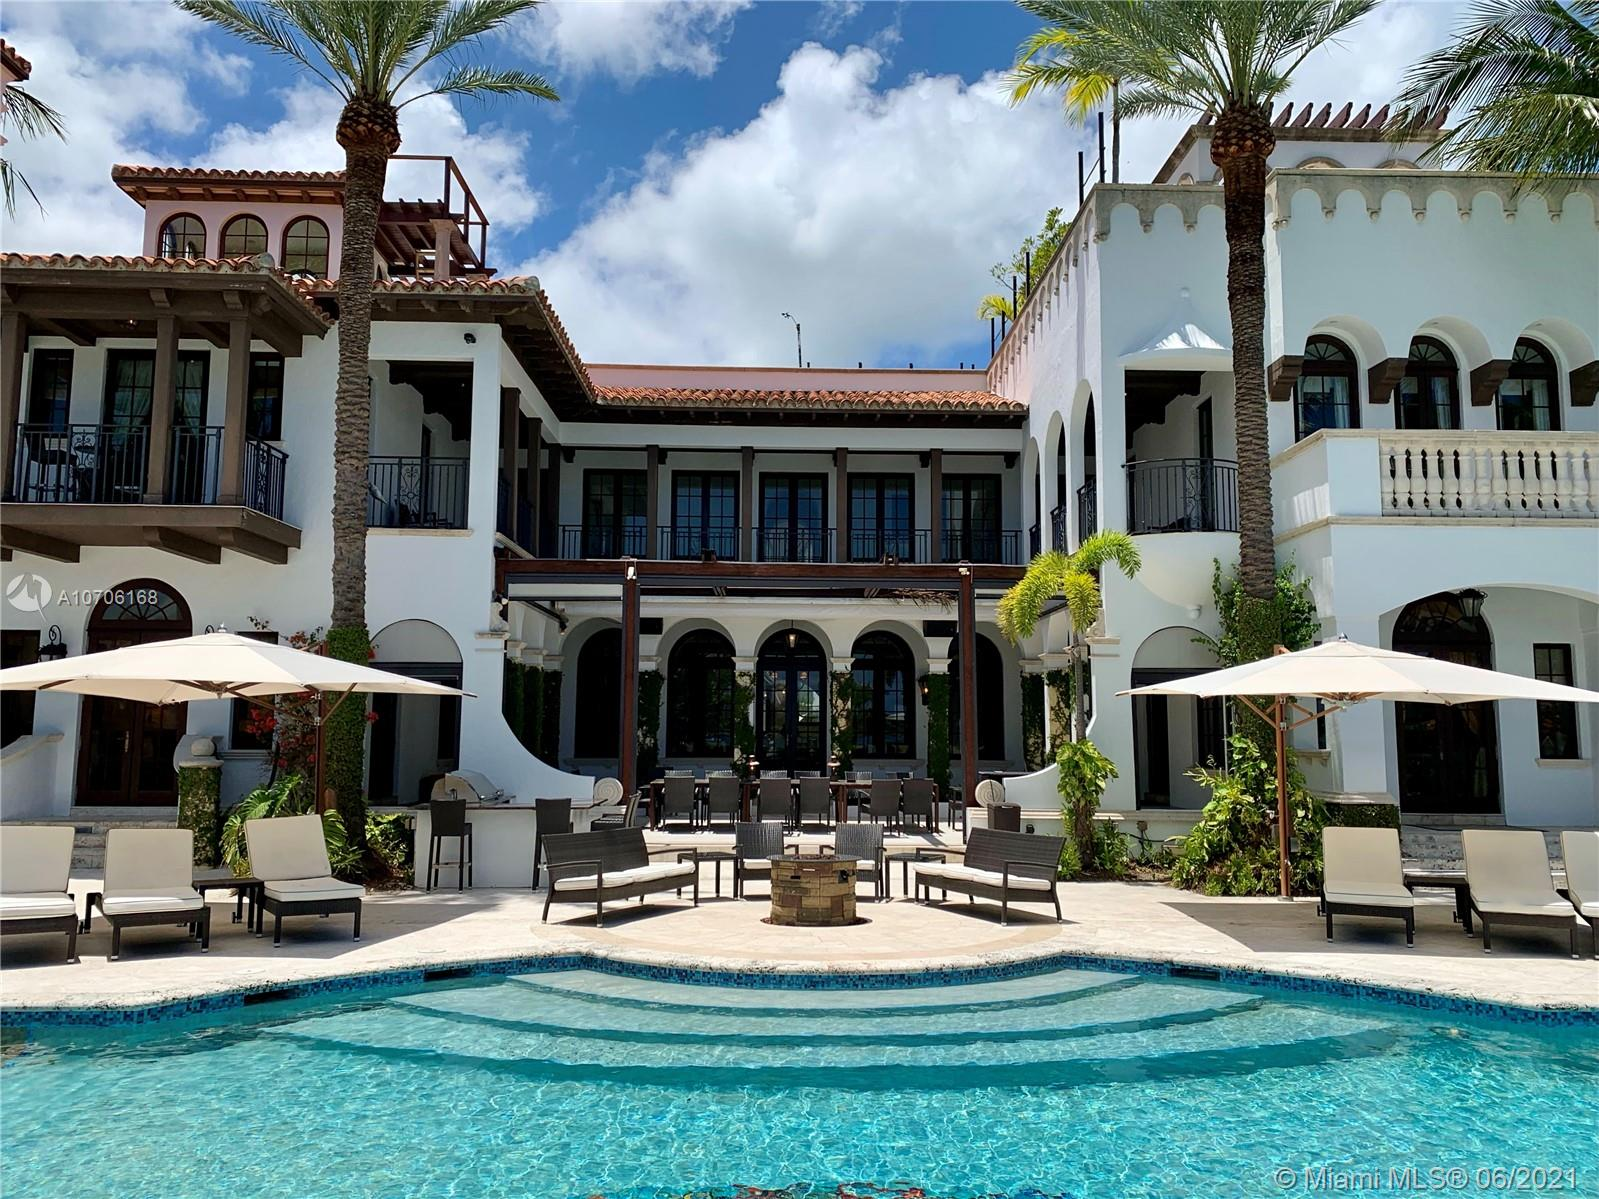 10 PALM AVENUE, Miami Beach, FL 33139